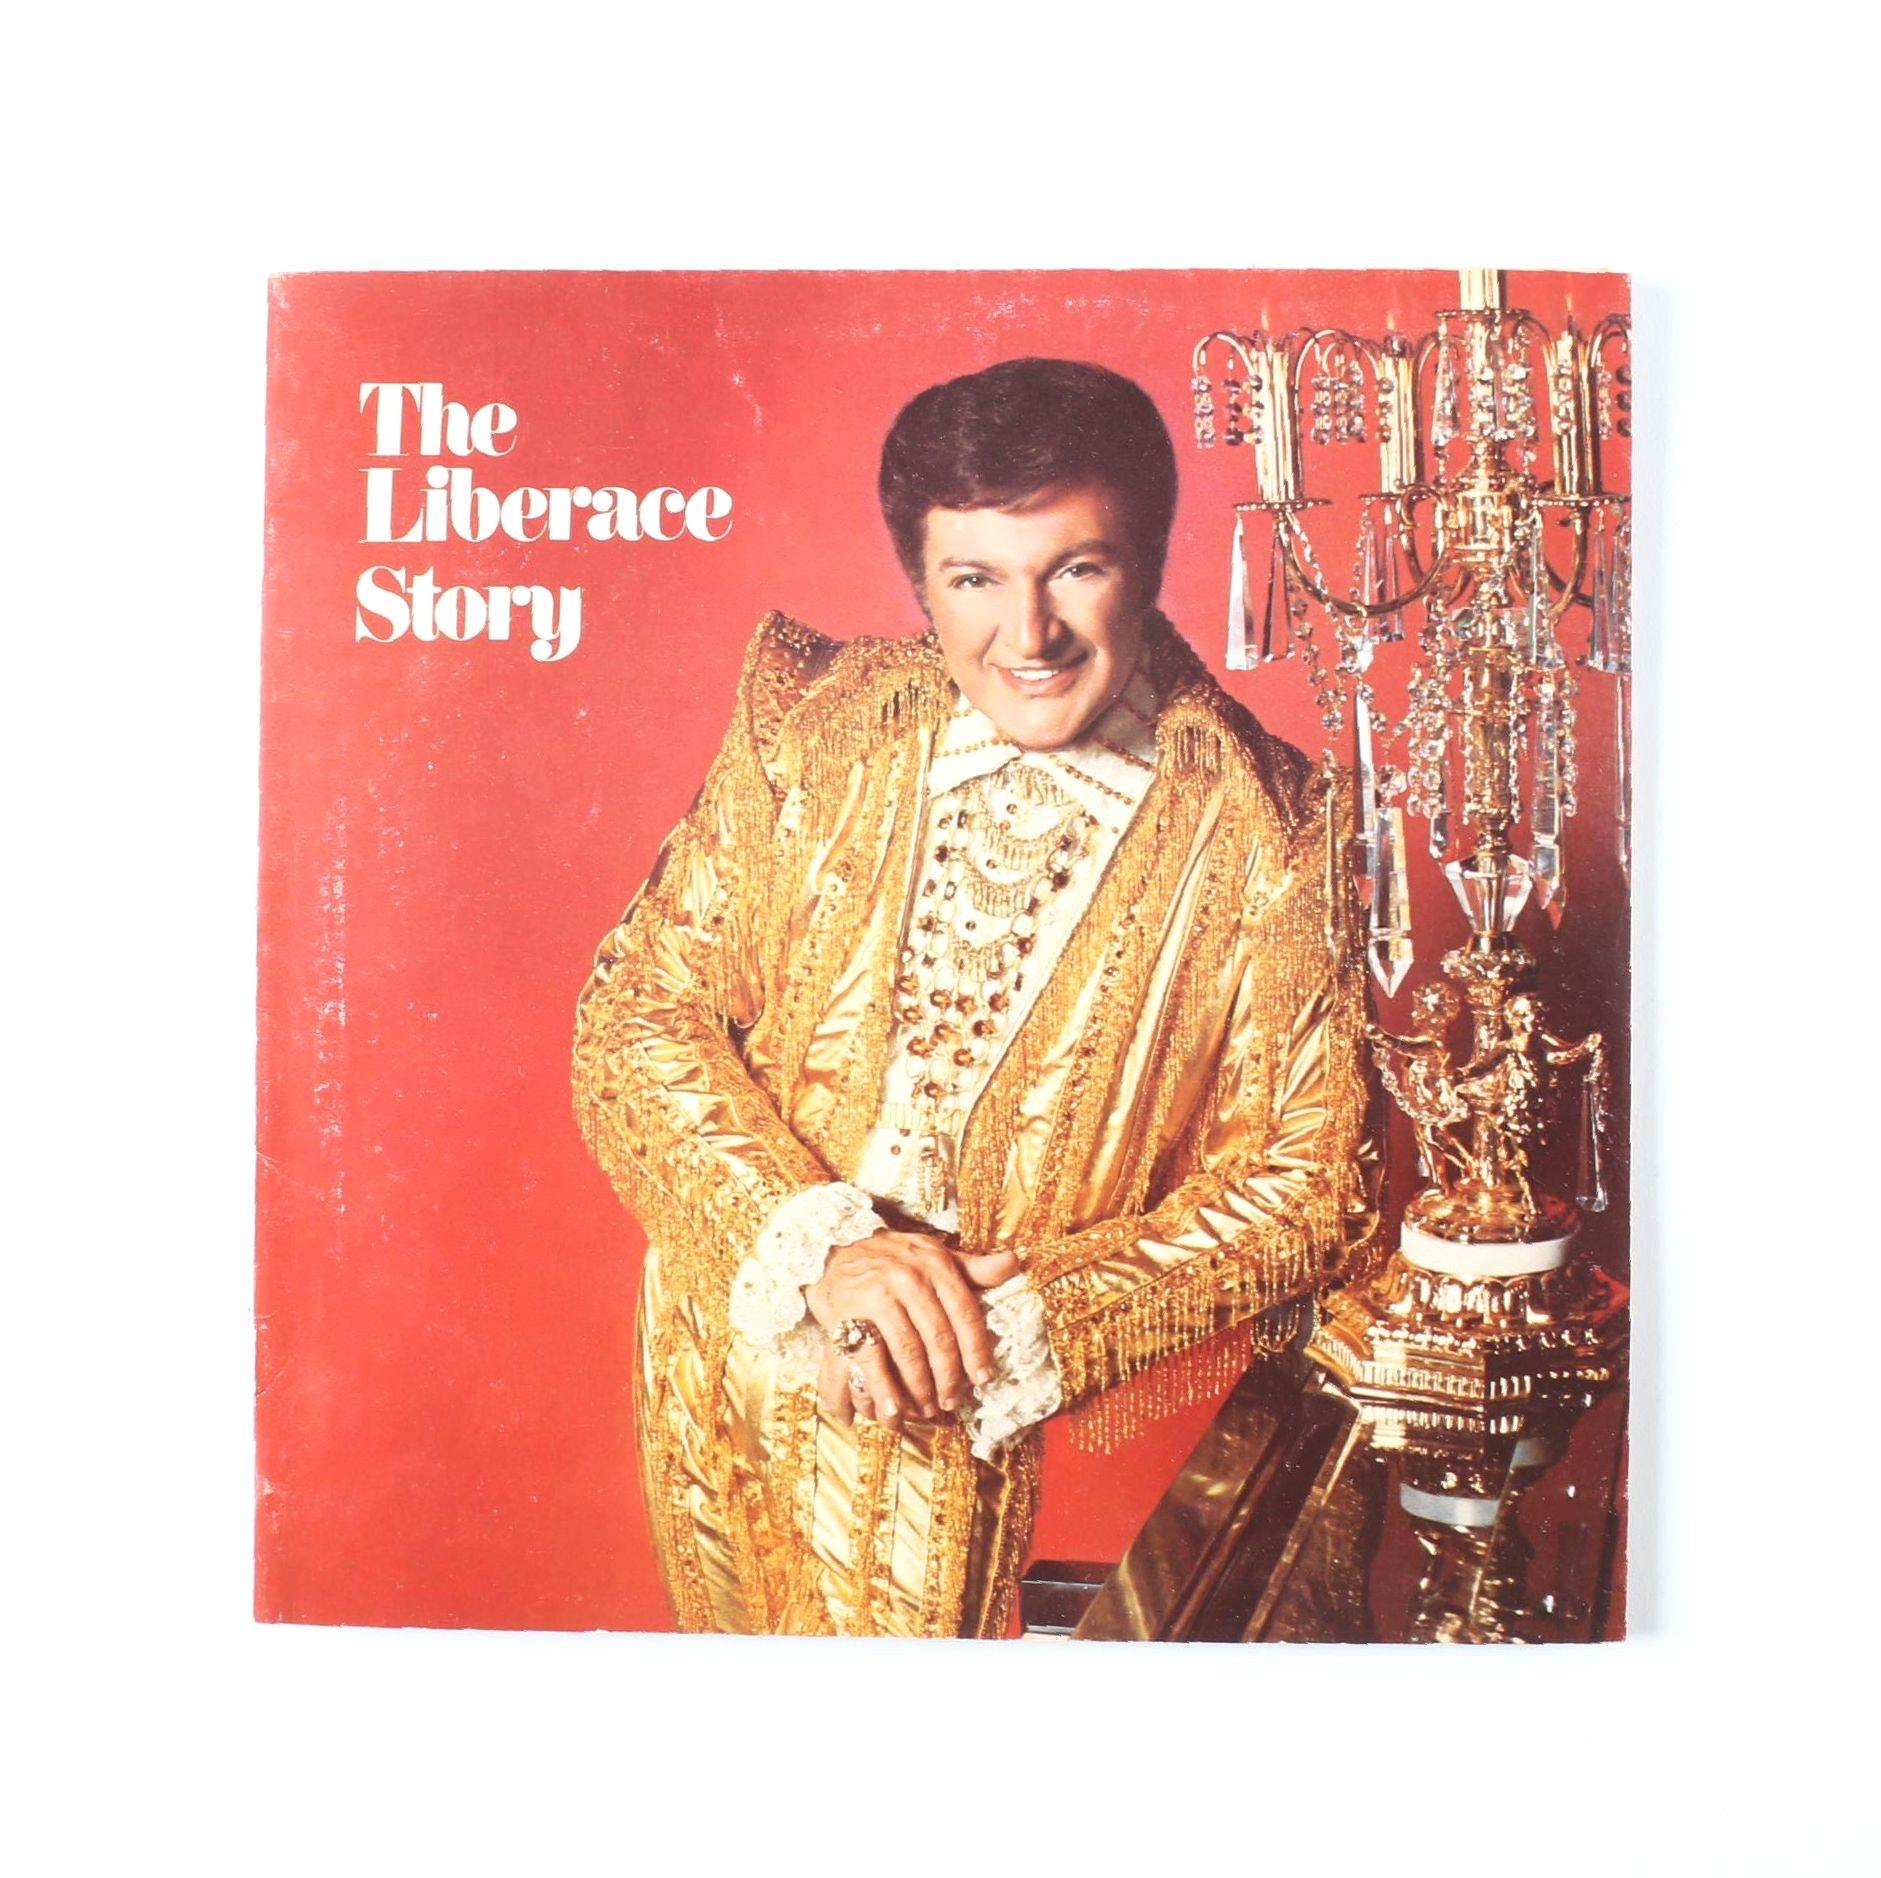 """The Liberace Story"" 1970s Concert Program"